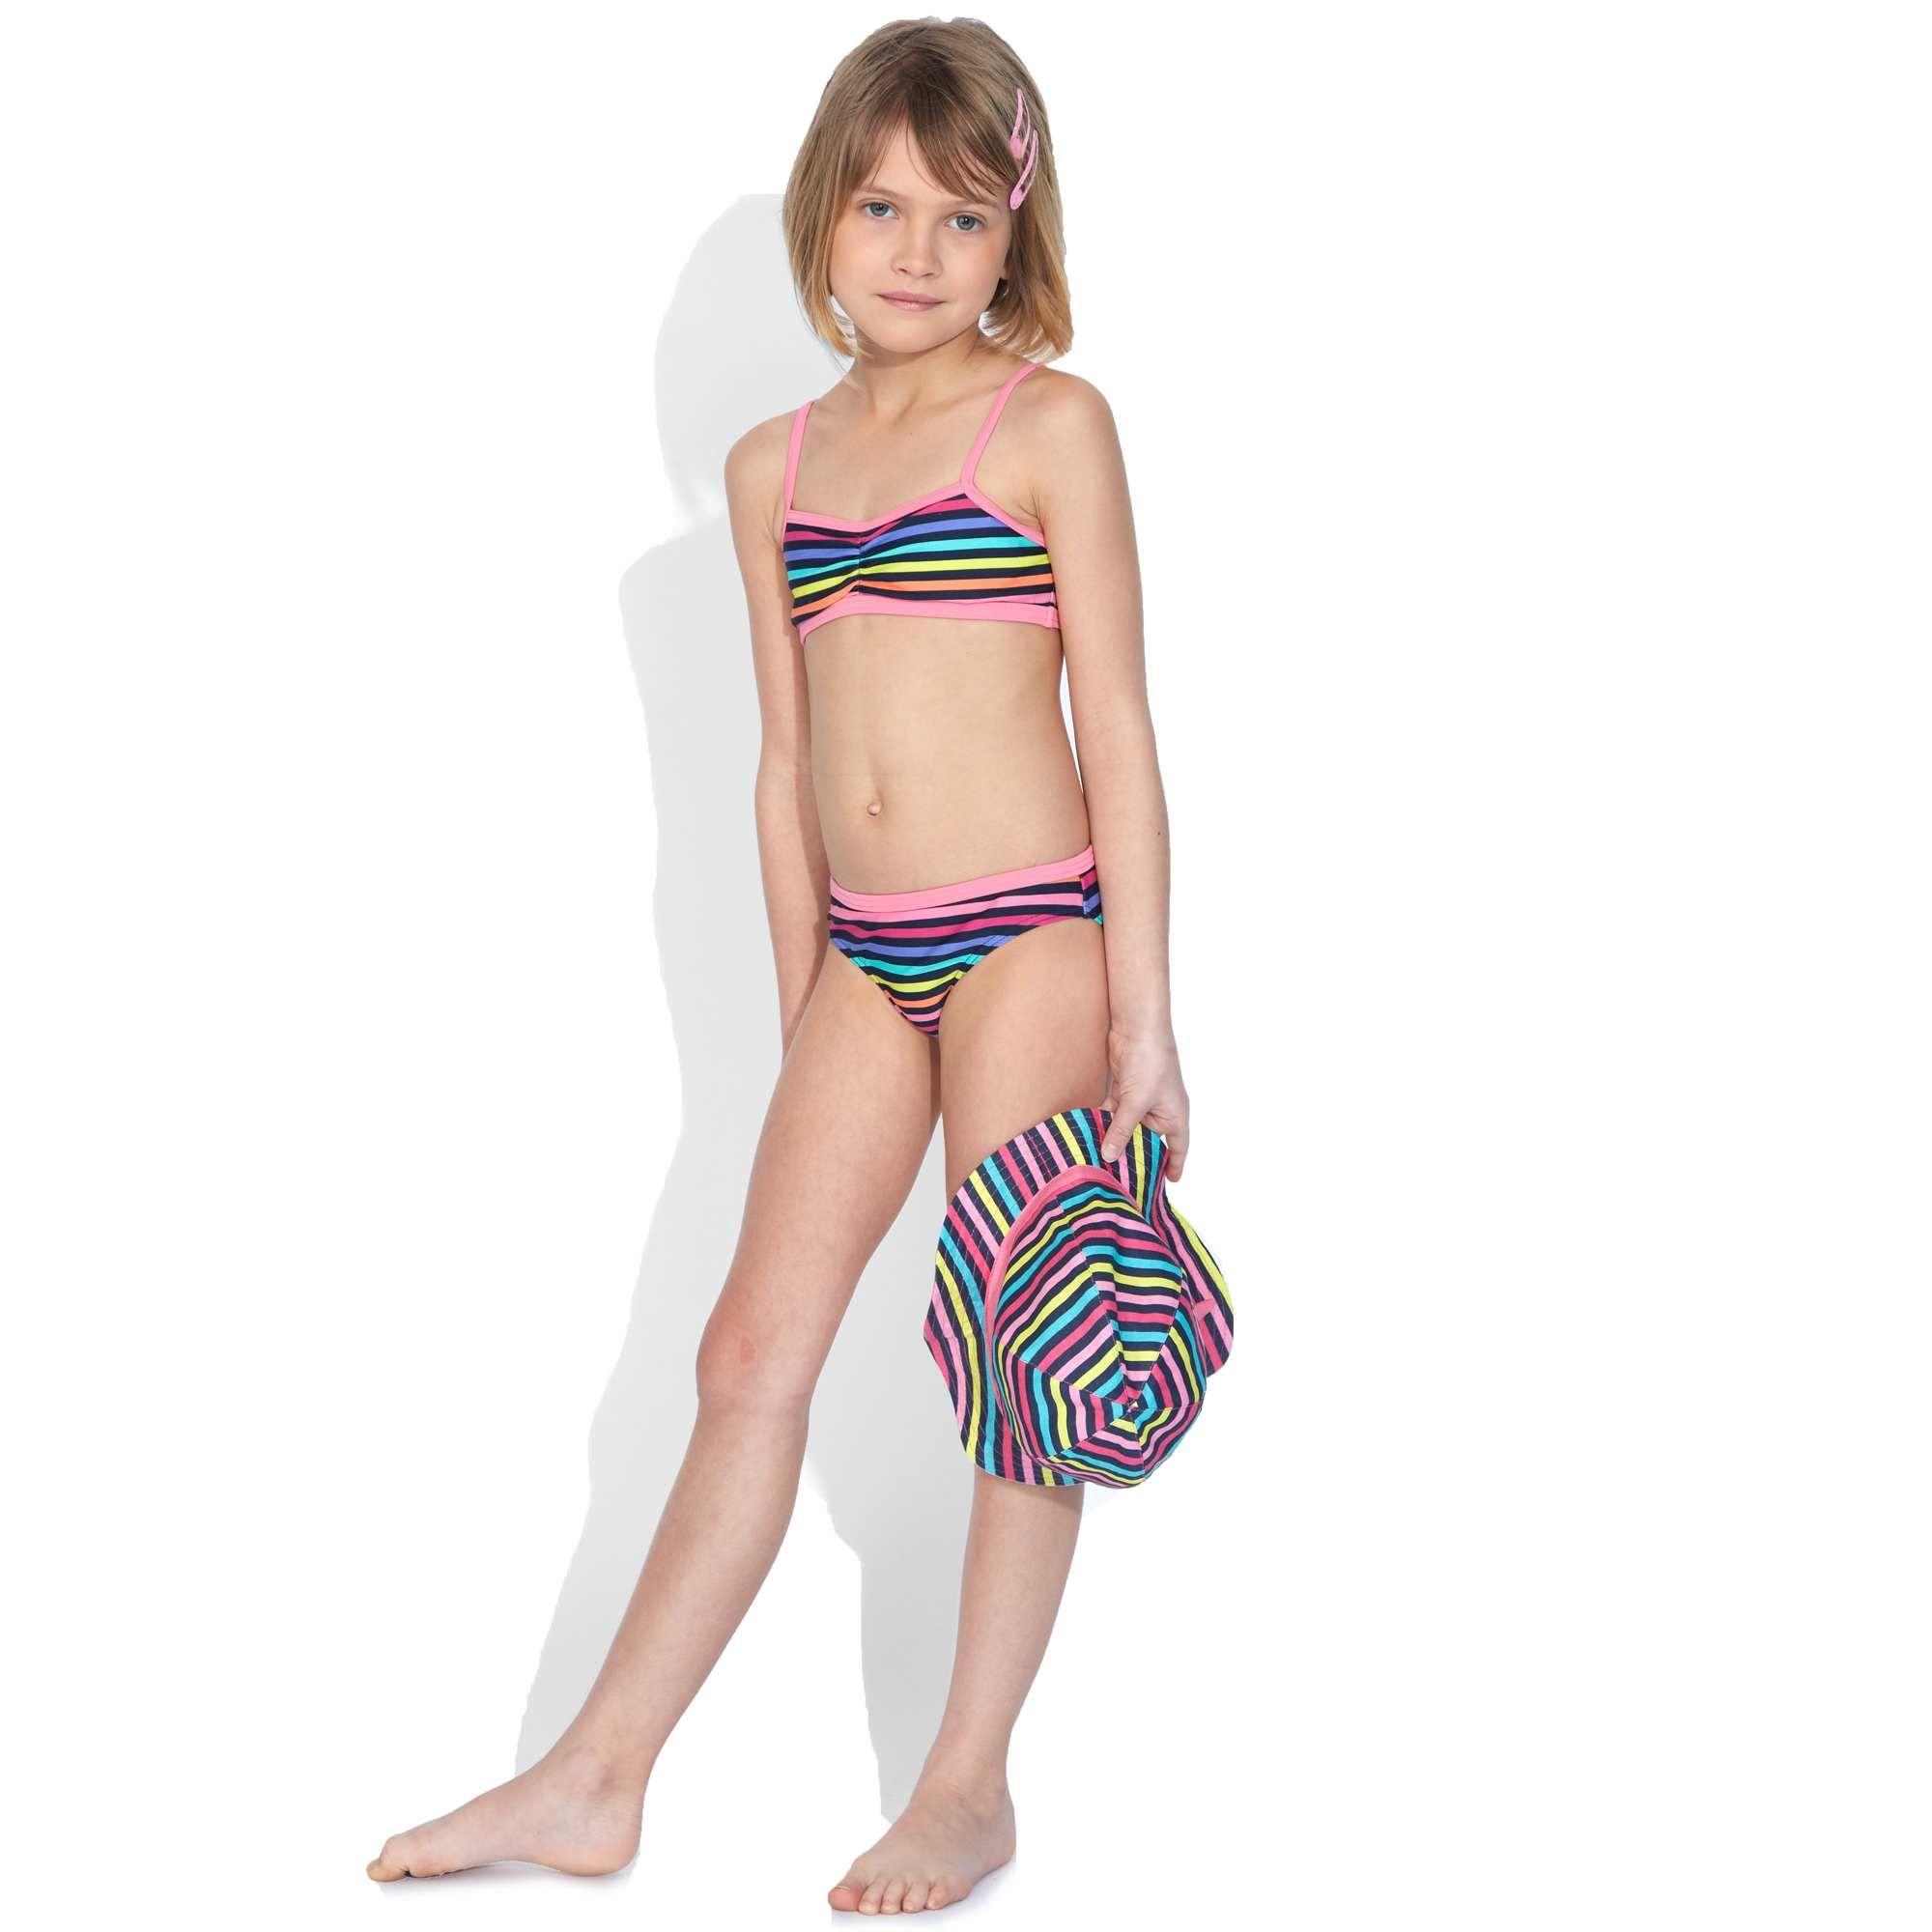 naked-bathing-suit-models-stuff-to-wank-over